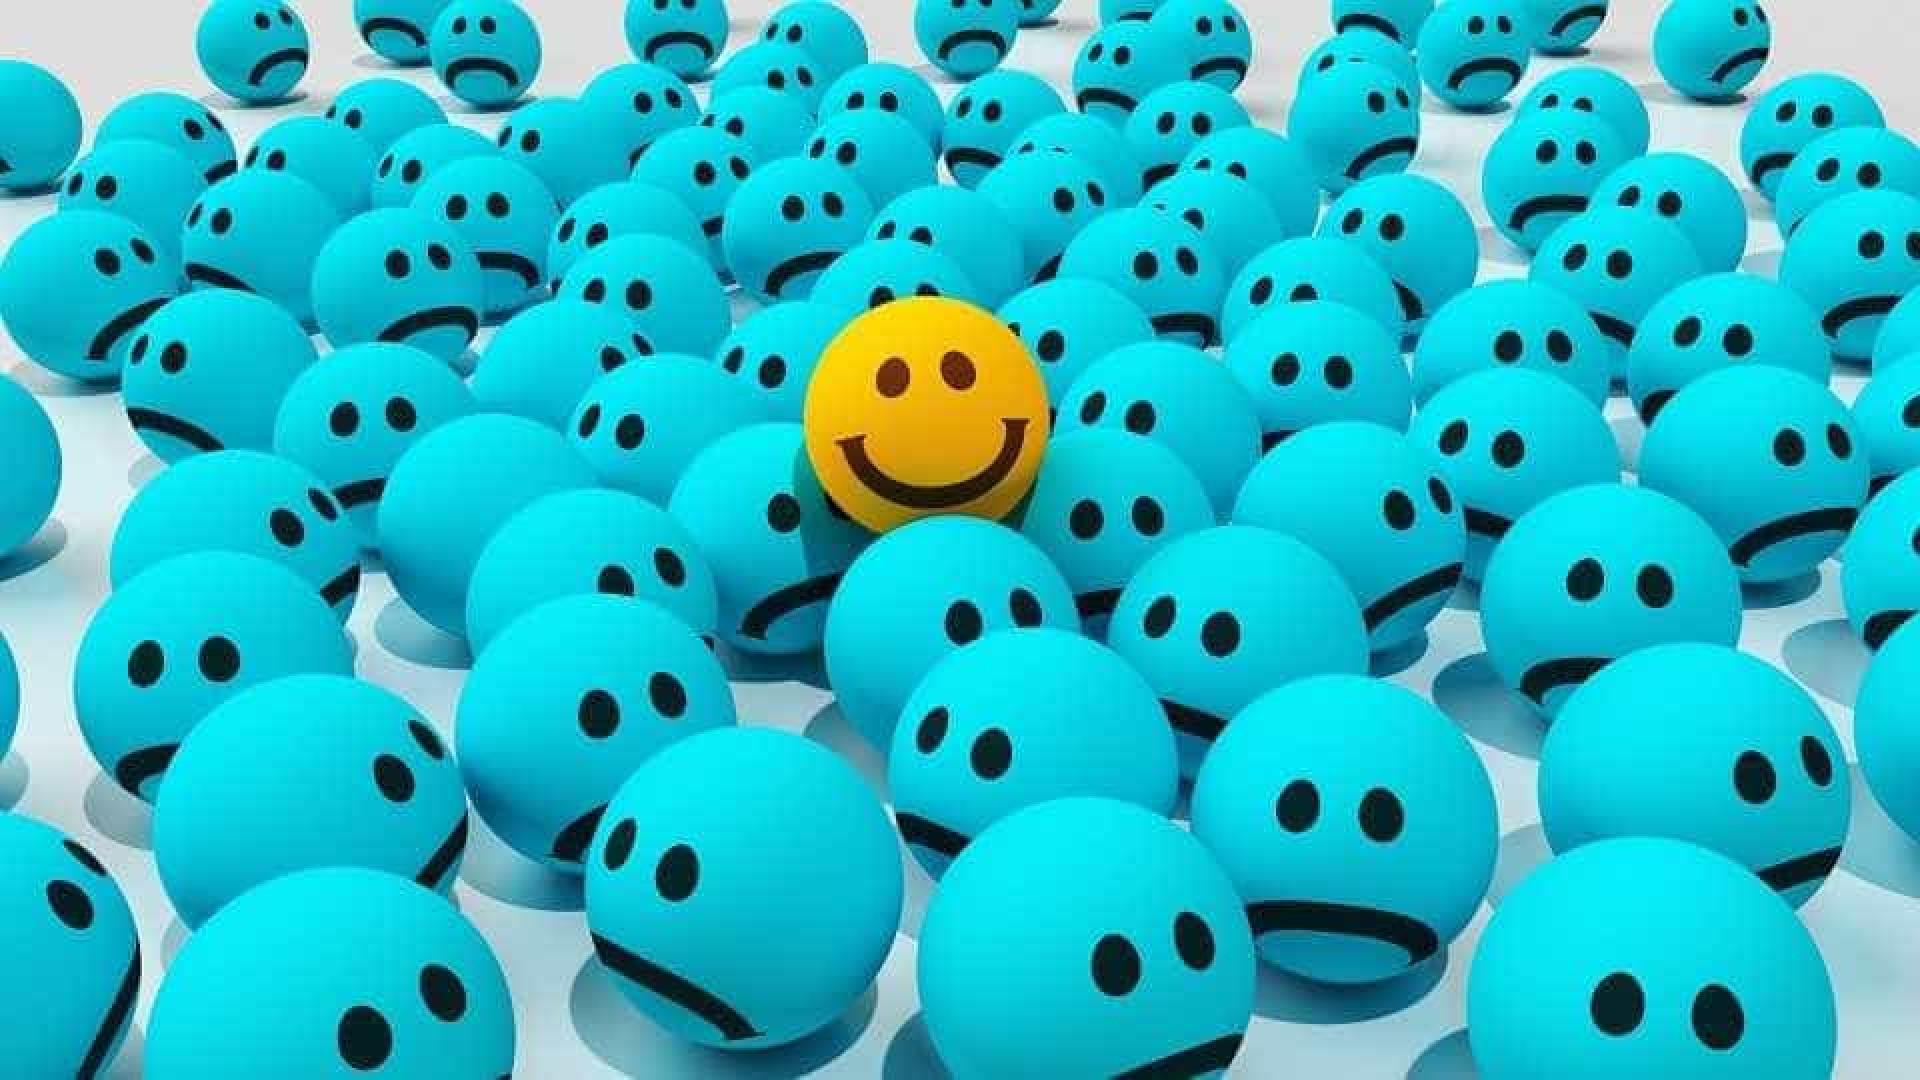 Whatsapp vai lançar função para colorir emojis; teste já